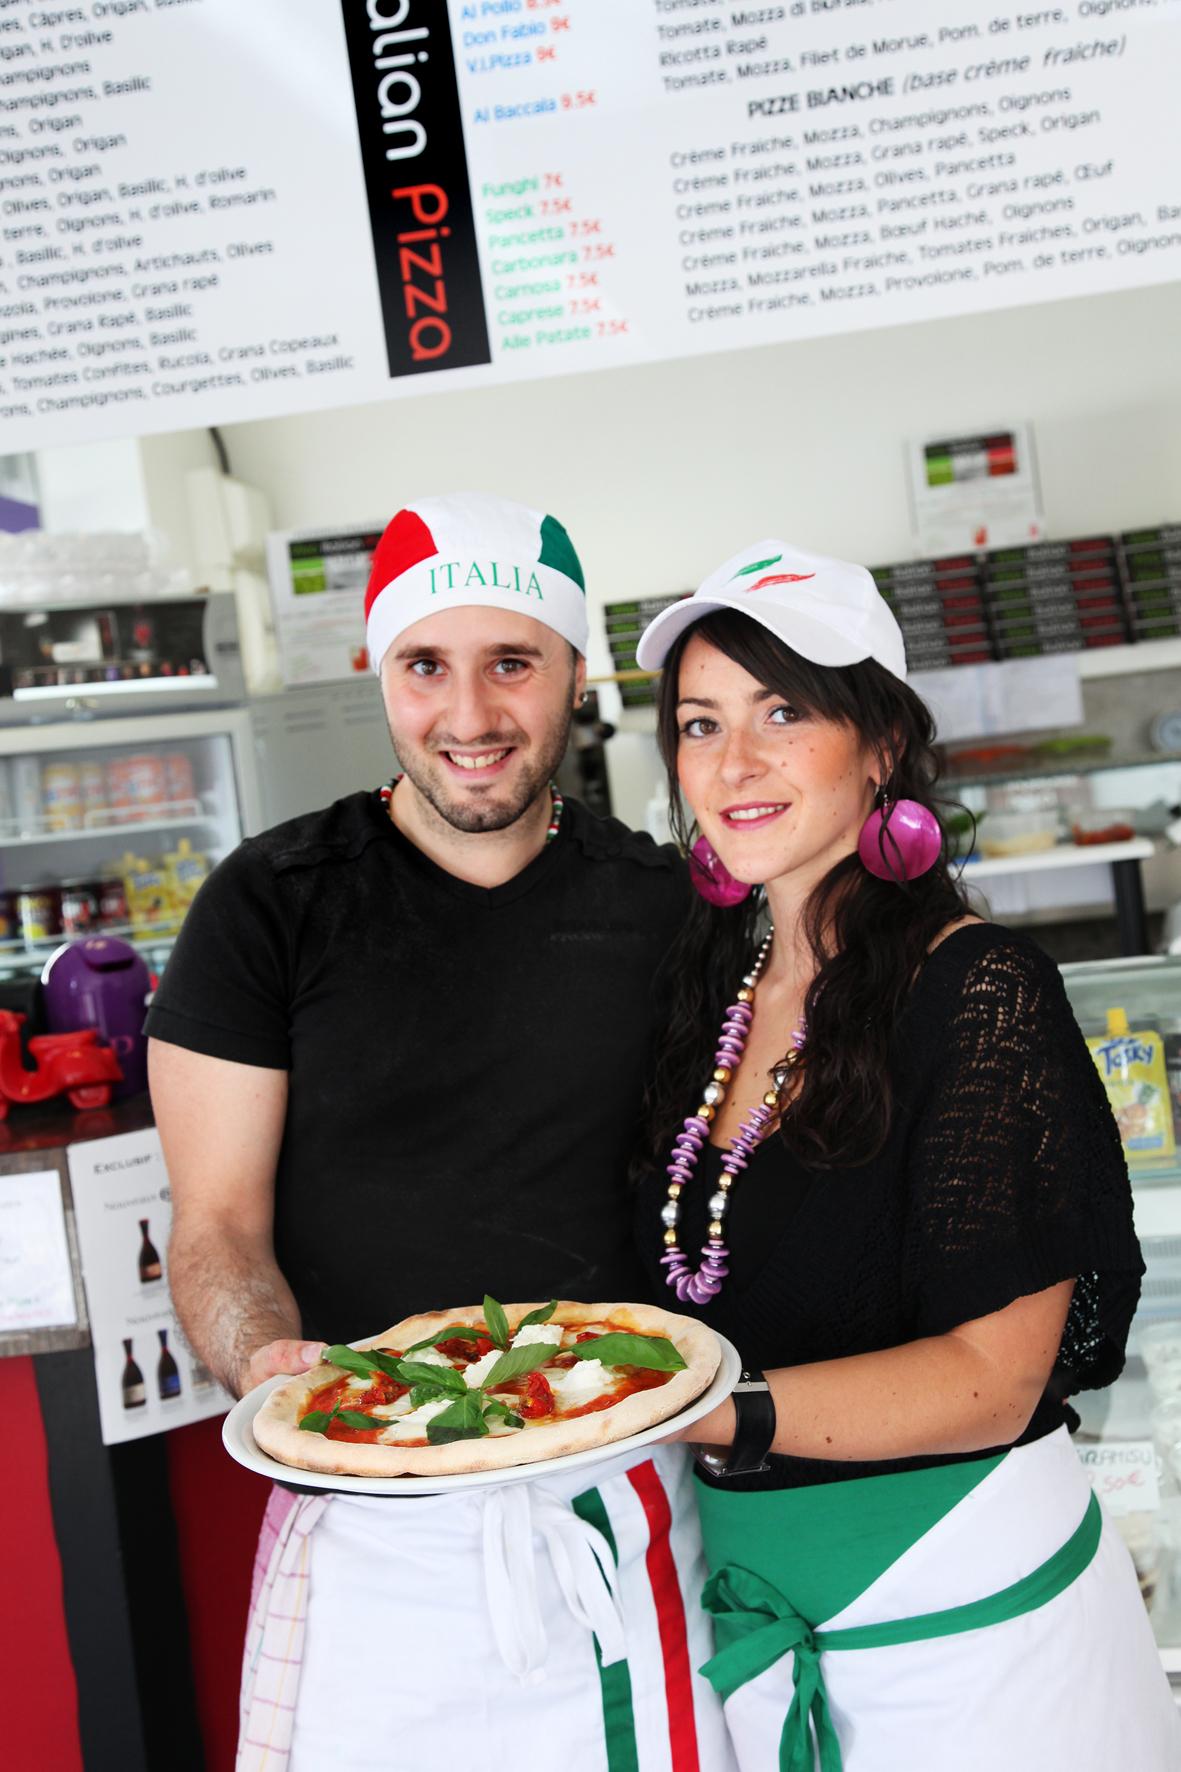 Viva Italian Pizza (V.I.P)